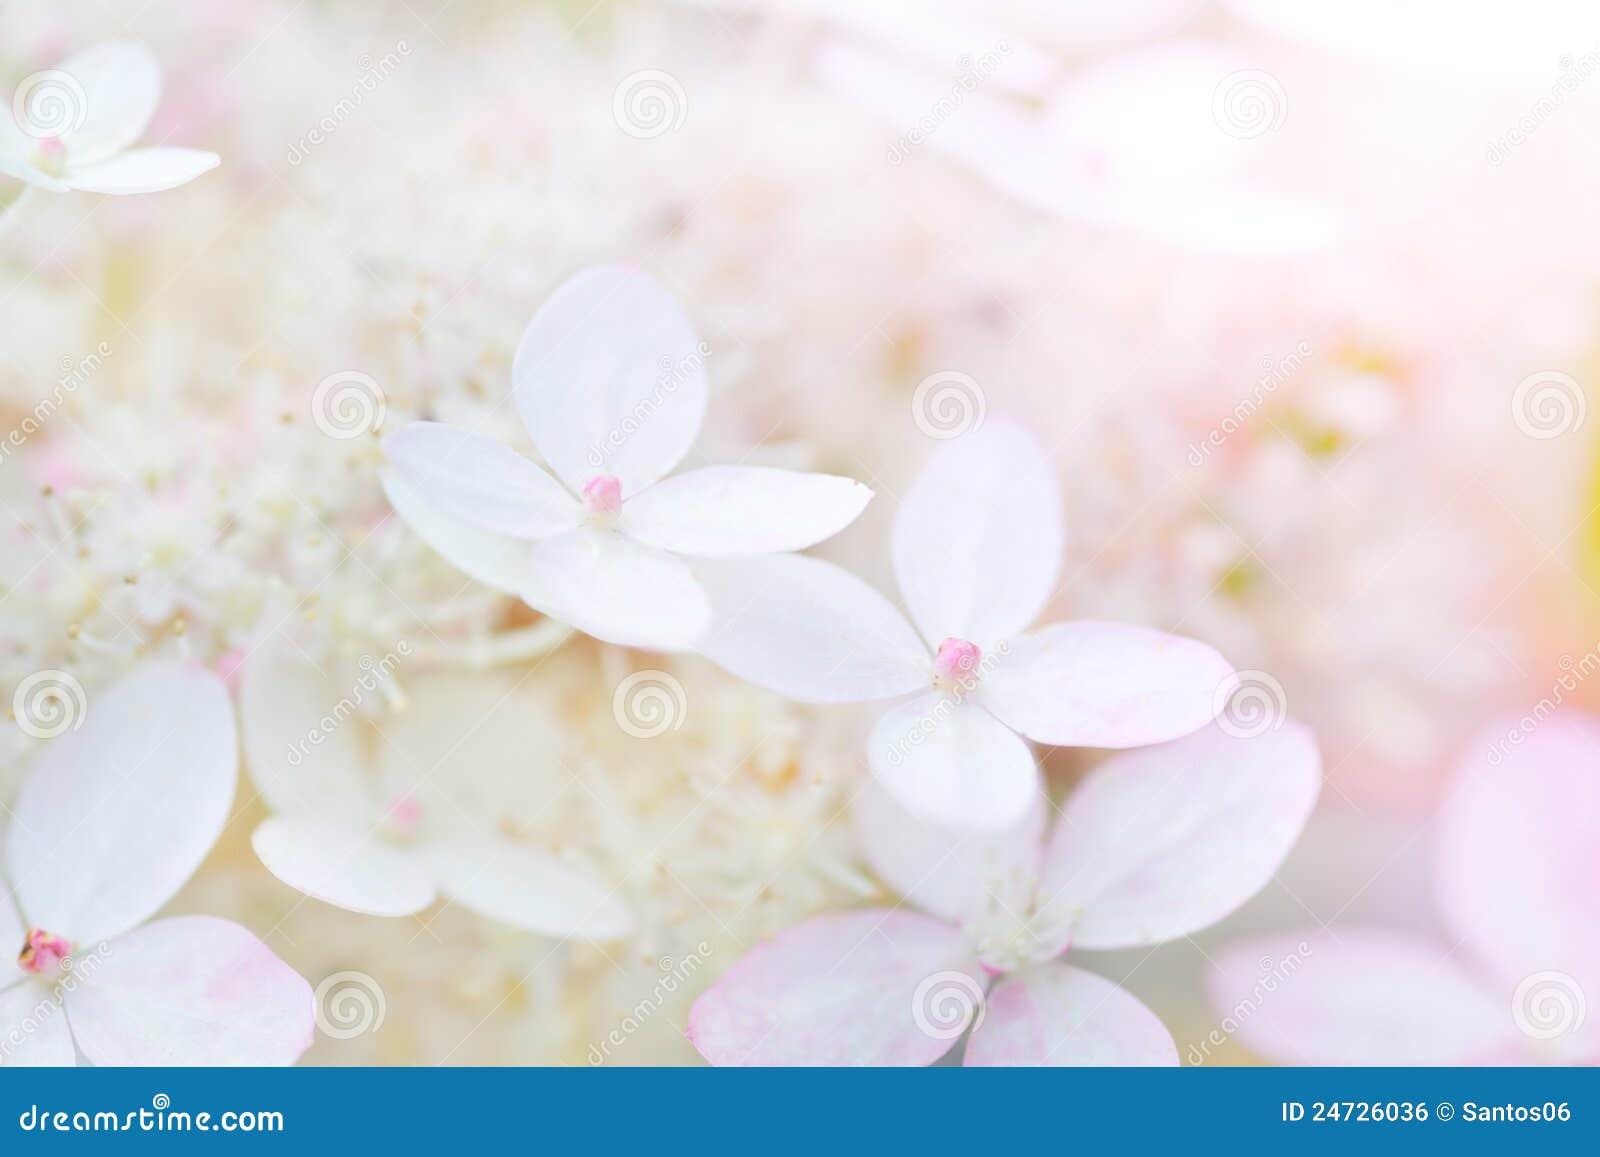 Floresce delicadamente